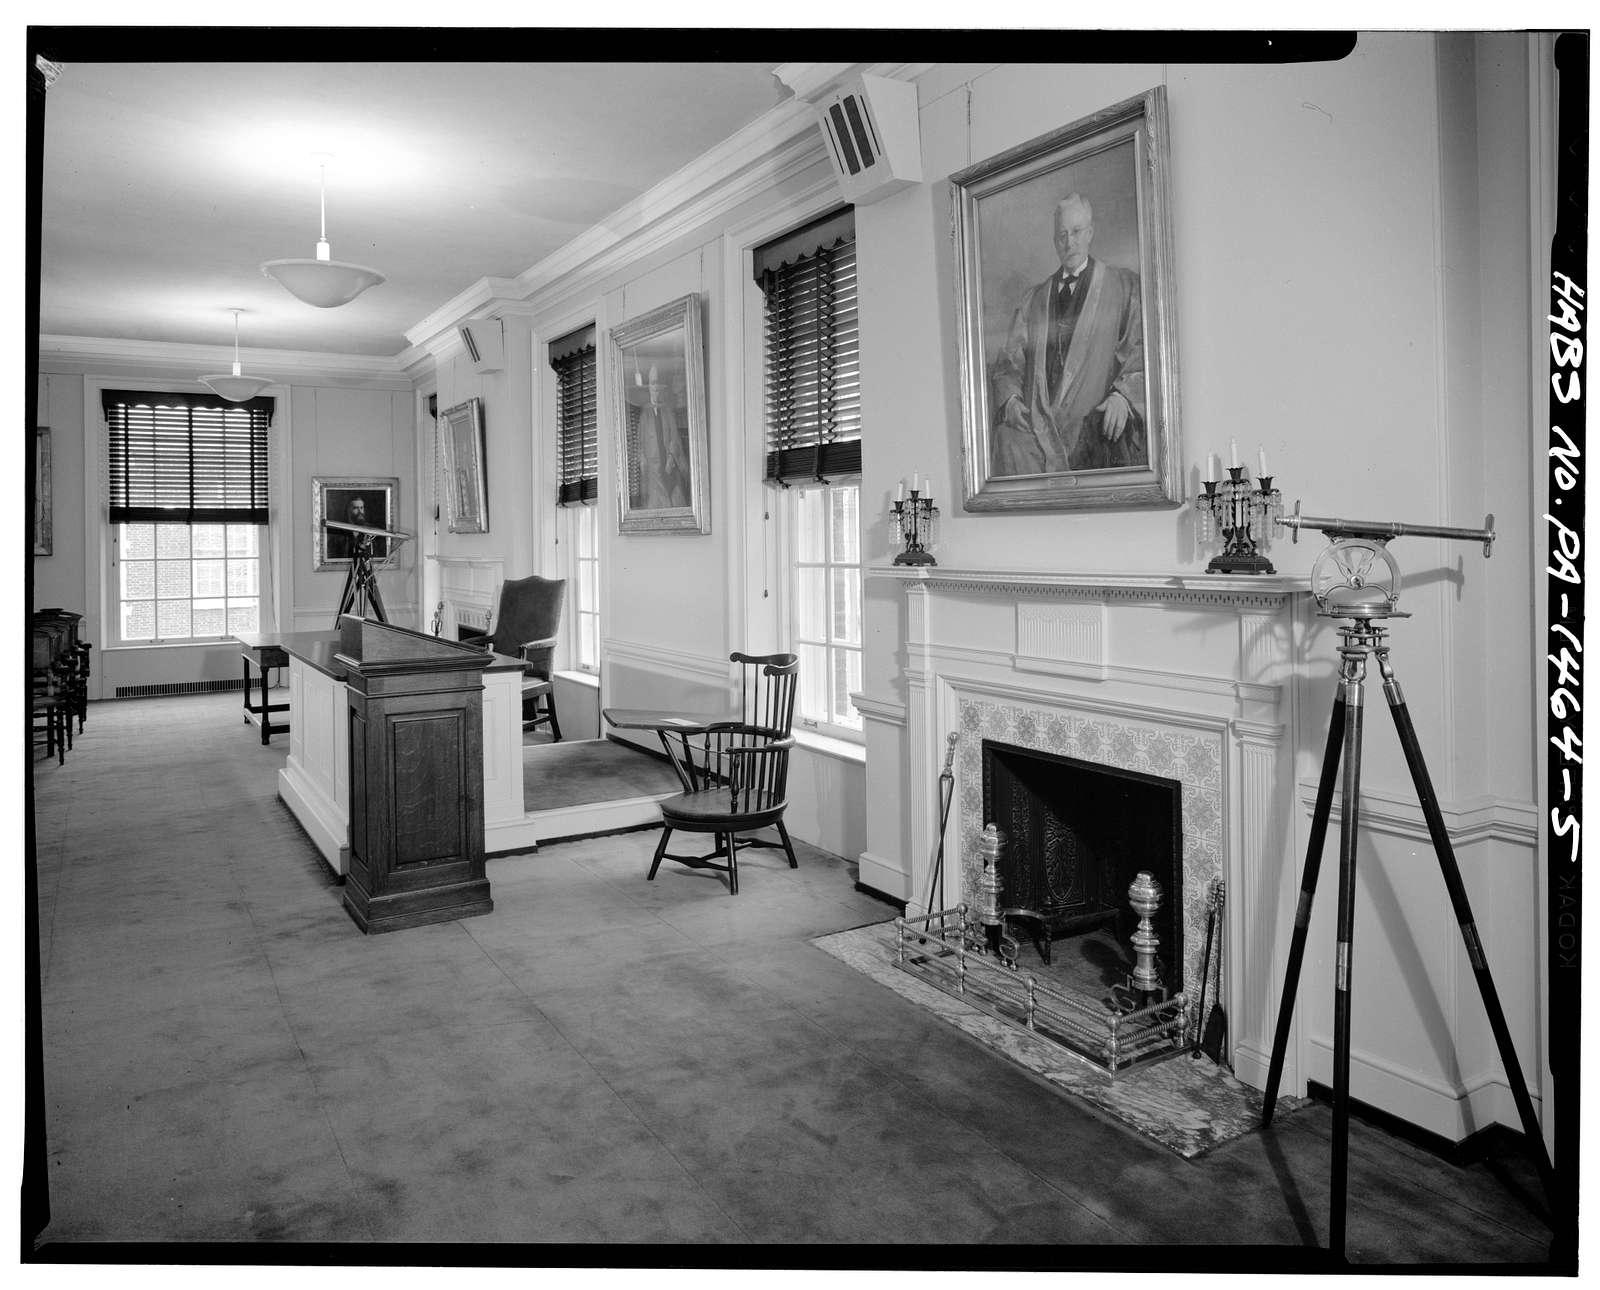 American Philosophical Society, 104 South Fifth Street, Philadelphia, Philadelphia County, PA